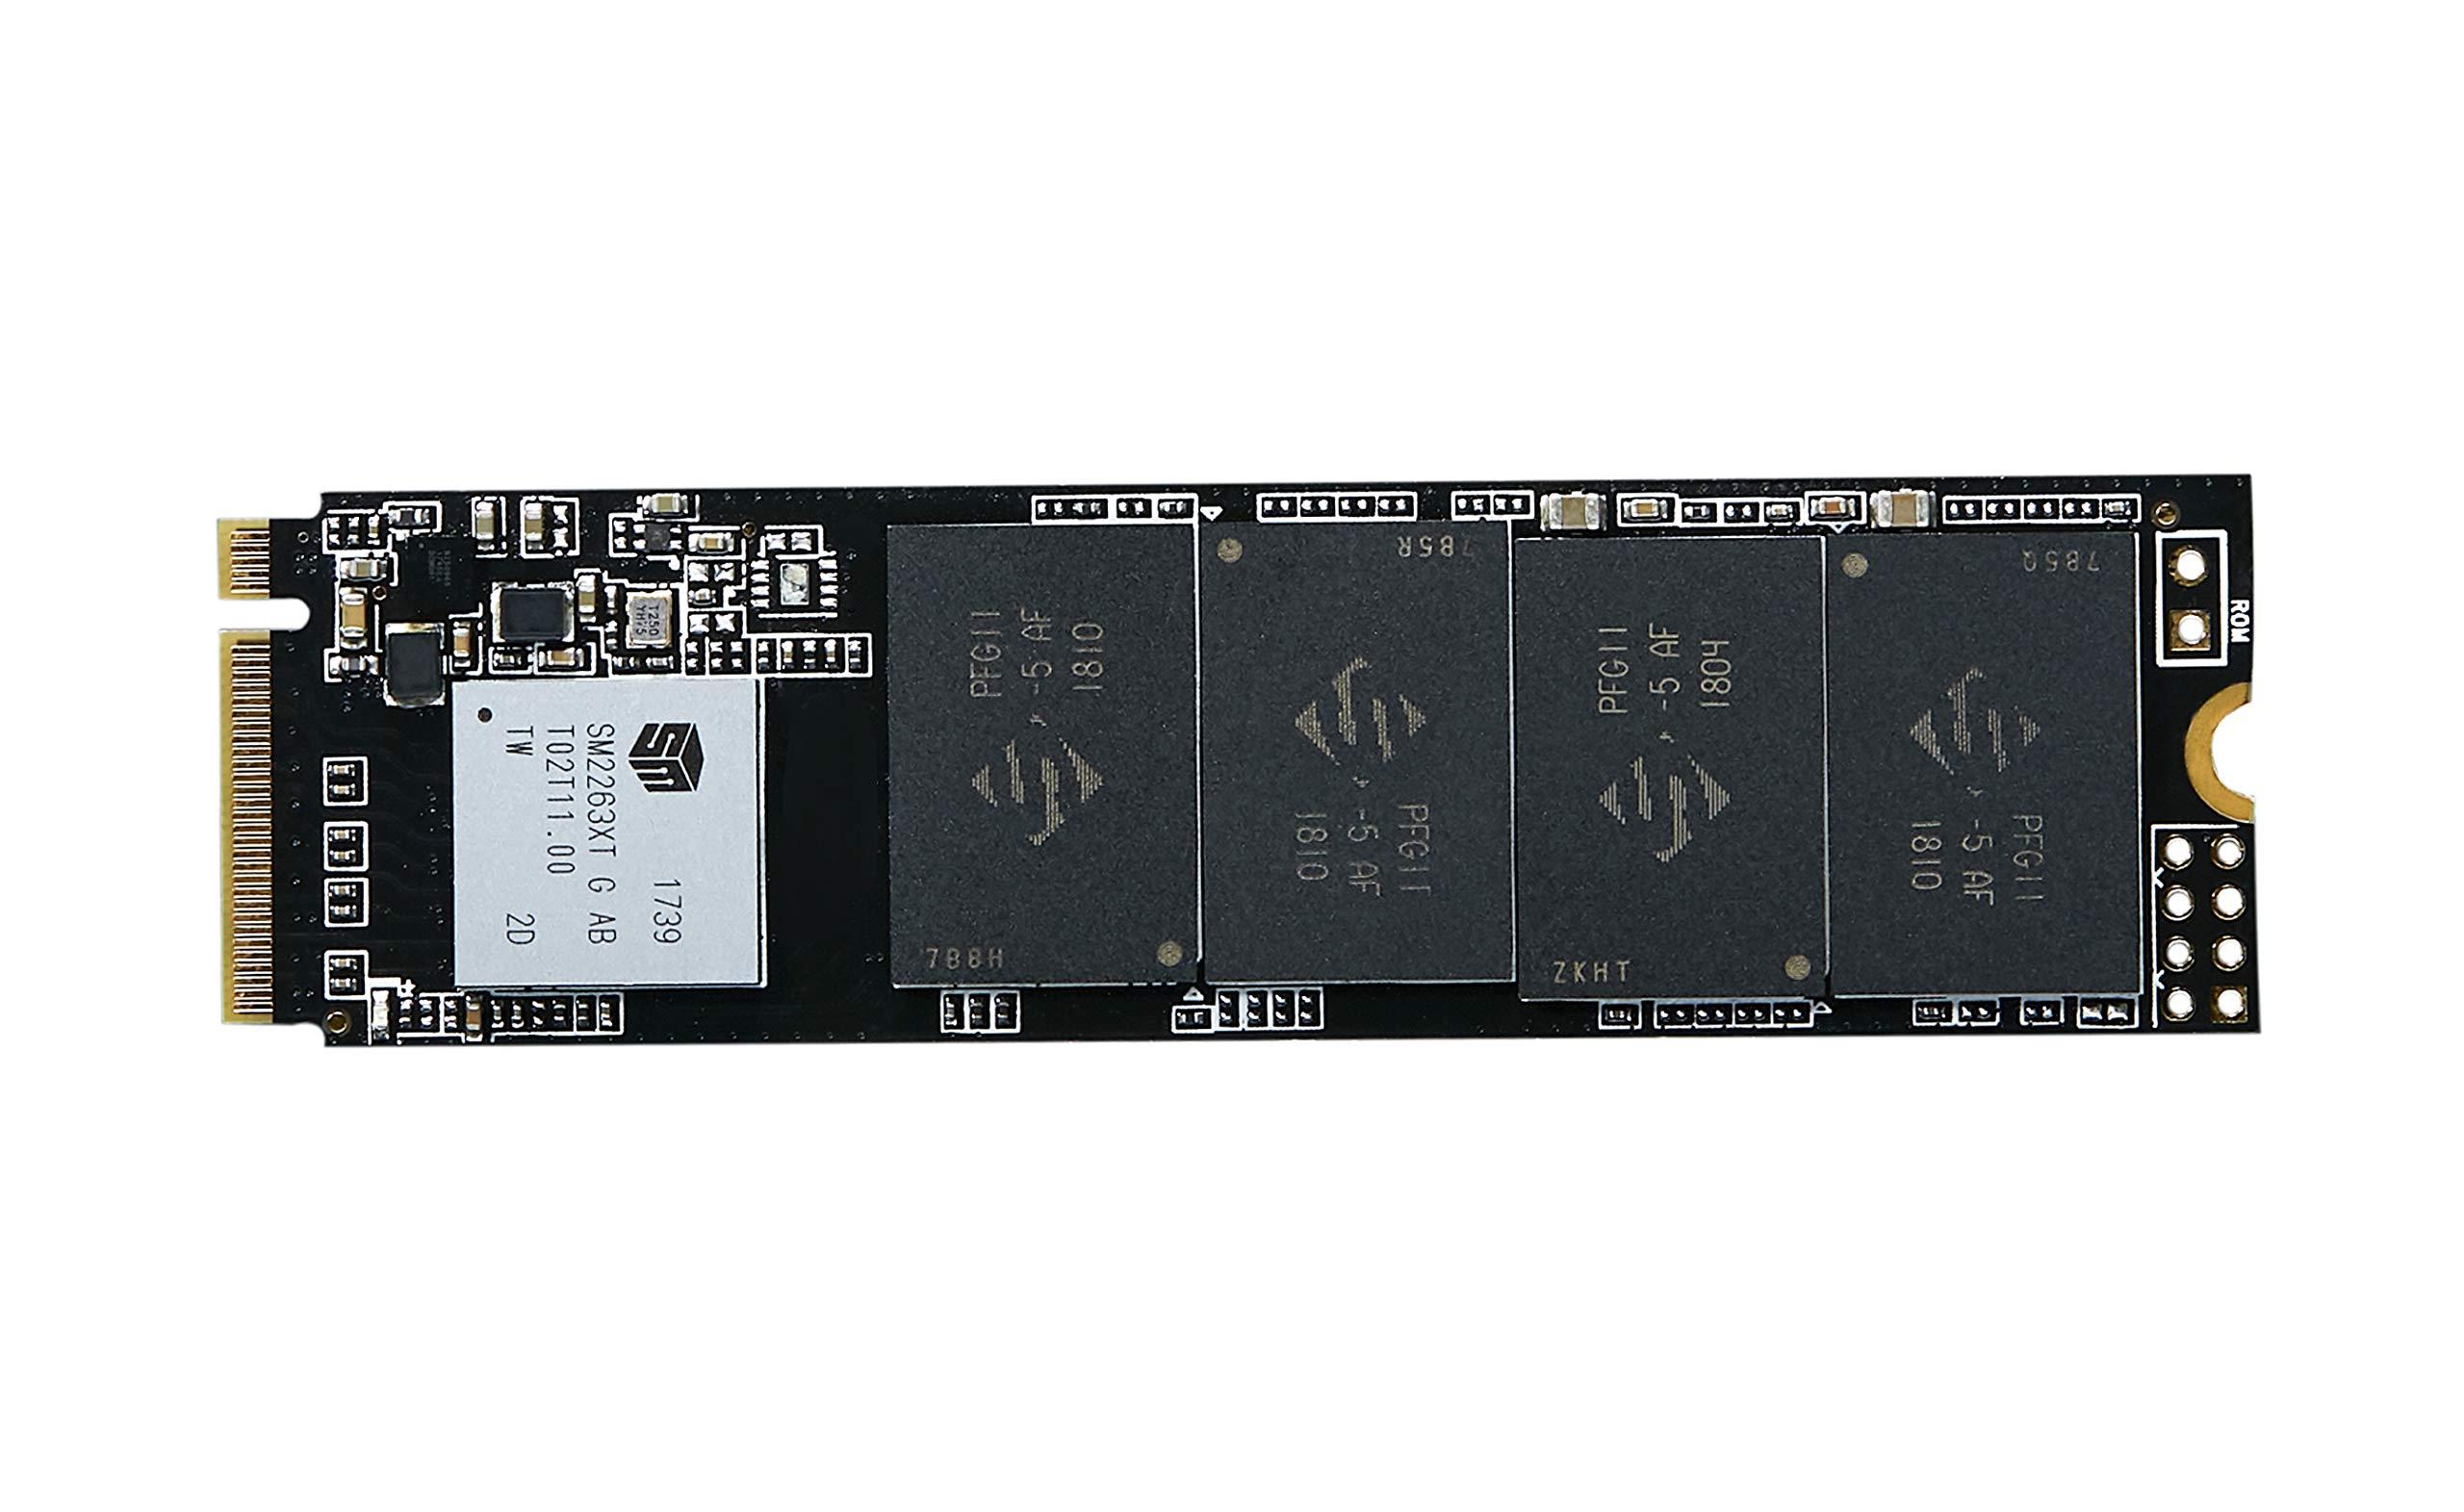 KingSpec 256GB PCIe NVMe 3D NAND Solid State Drive- M.2 Internal SSD (NE-256 2280) …